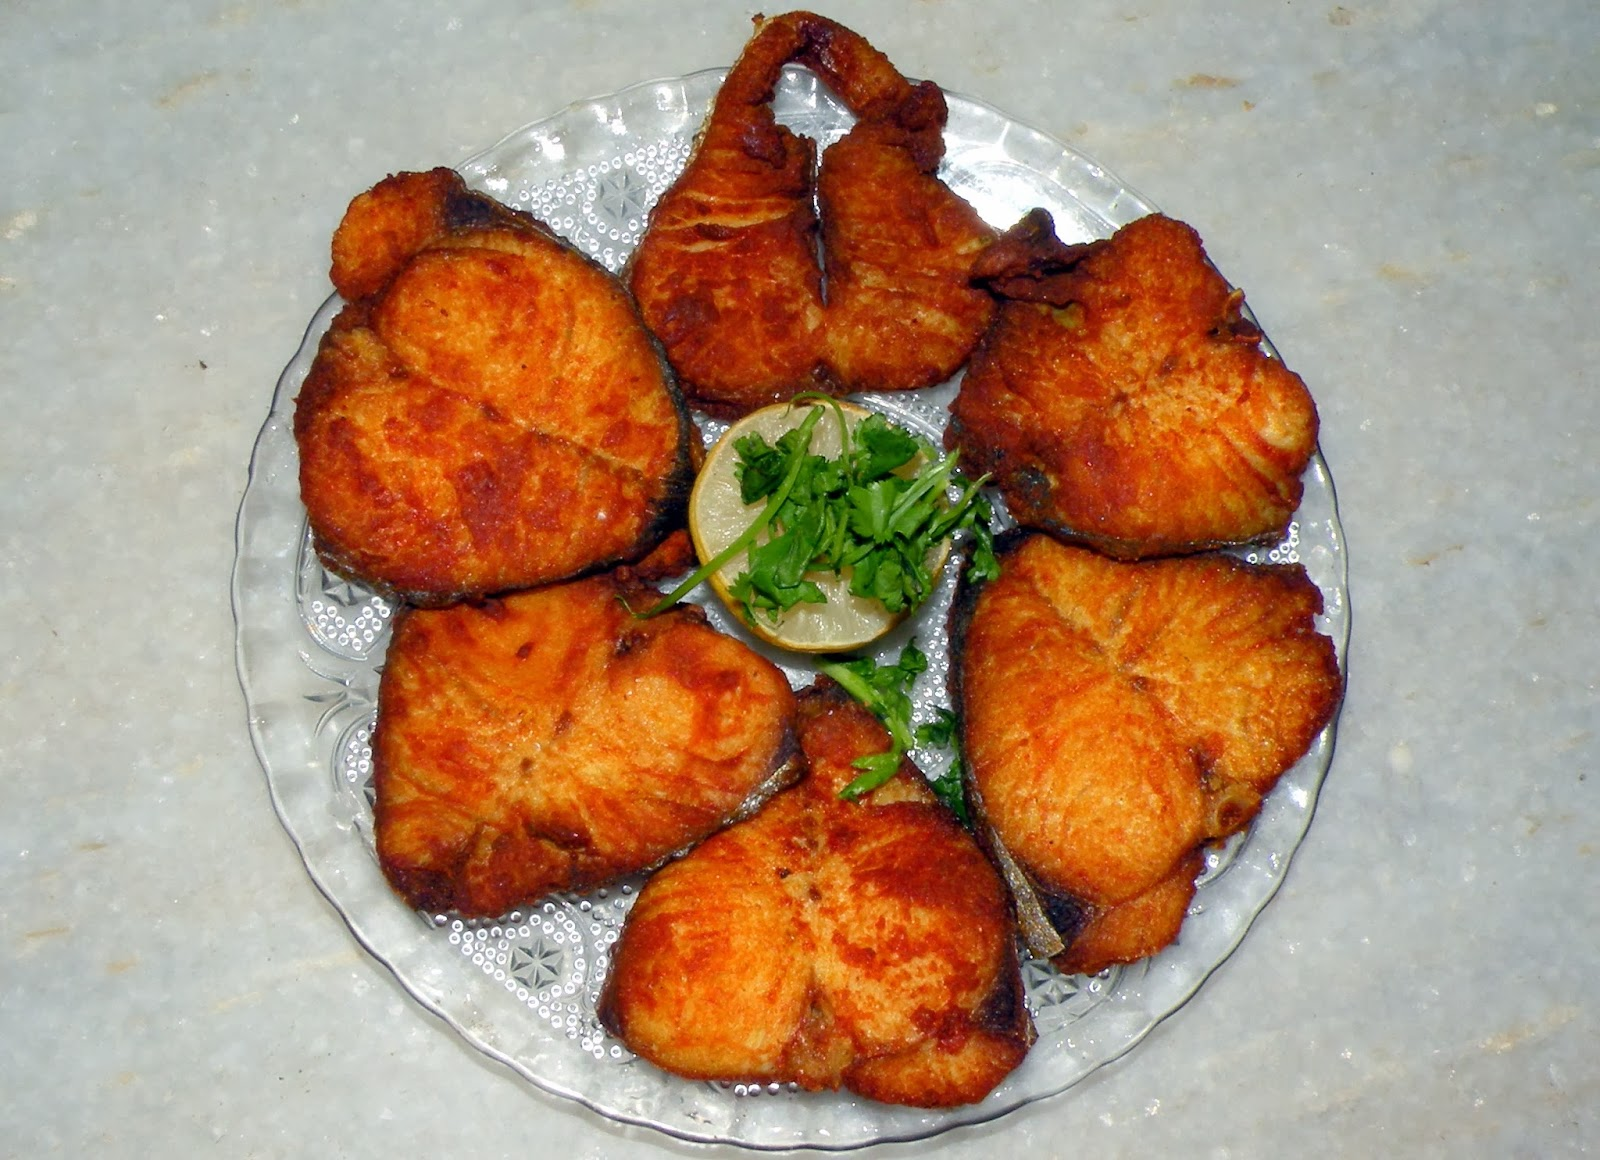 King fish fish fry recipe vanjaram fish fry recipe for Cliffords fish fry